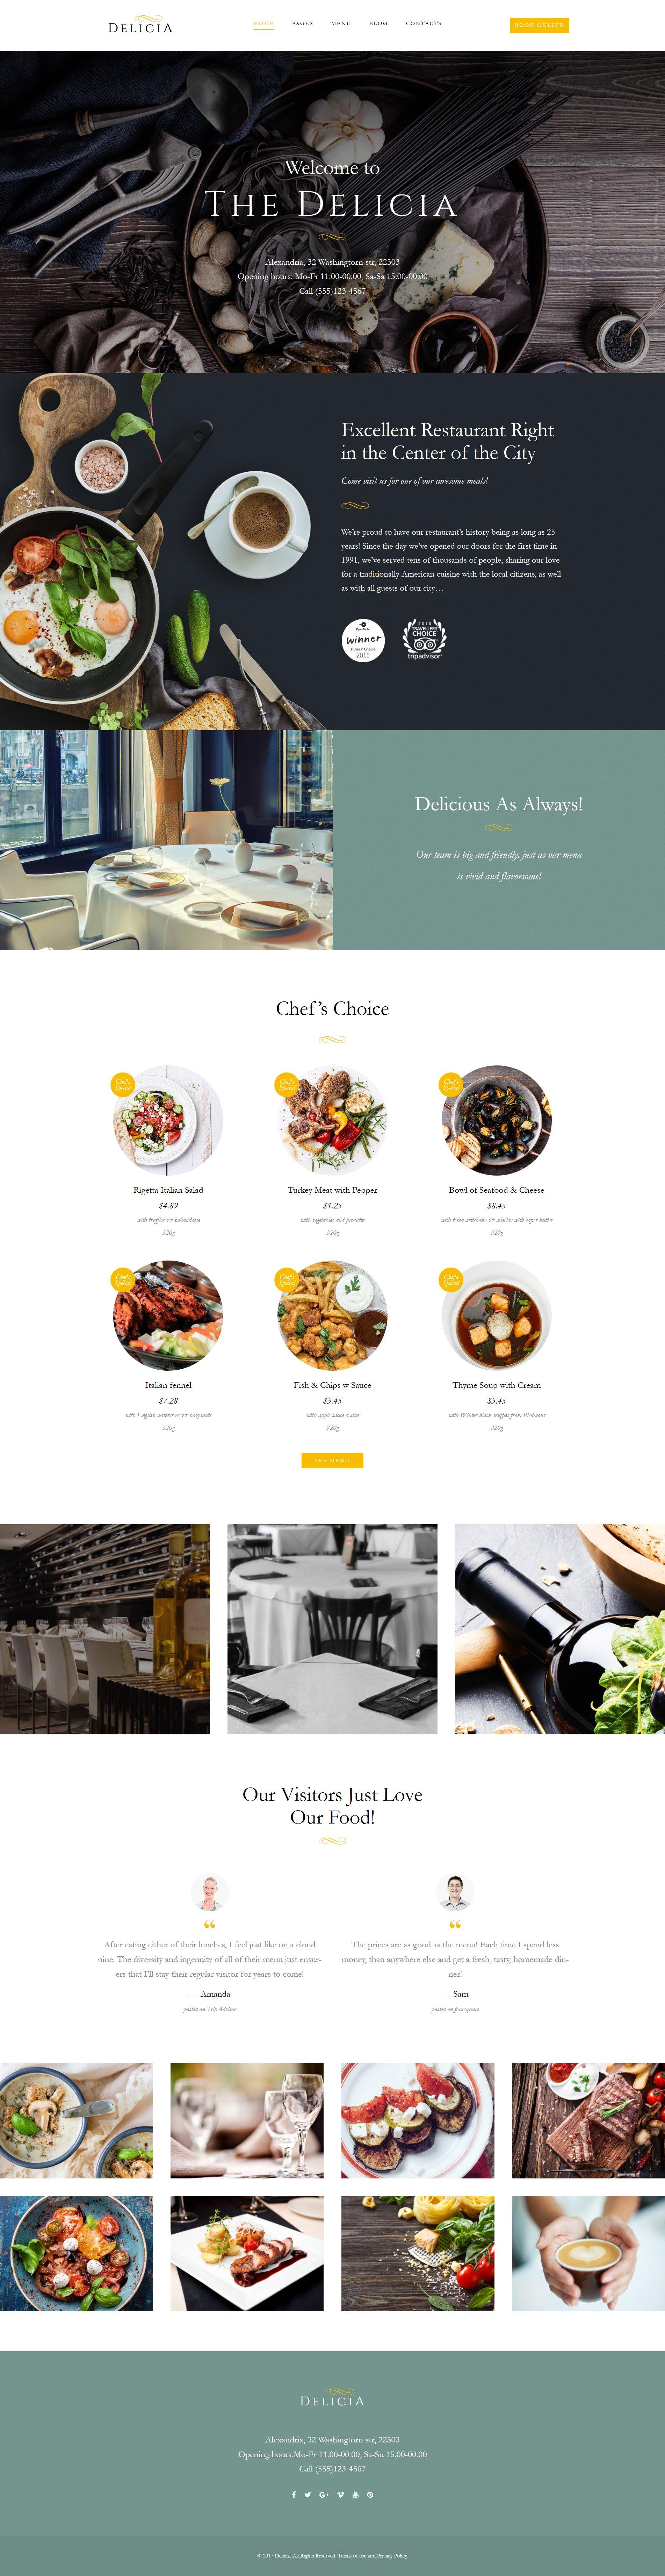 Responsive Delicia - Restaurant Responsive Wordpress #62386 - Ekran resmi